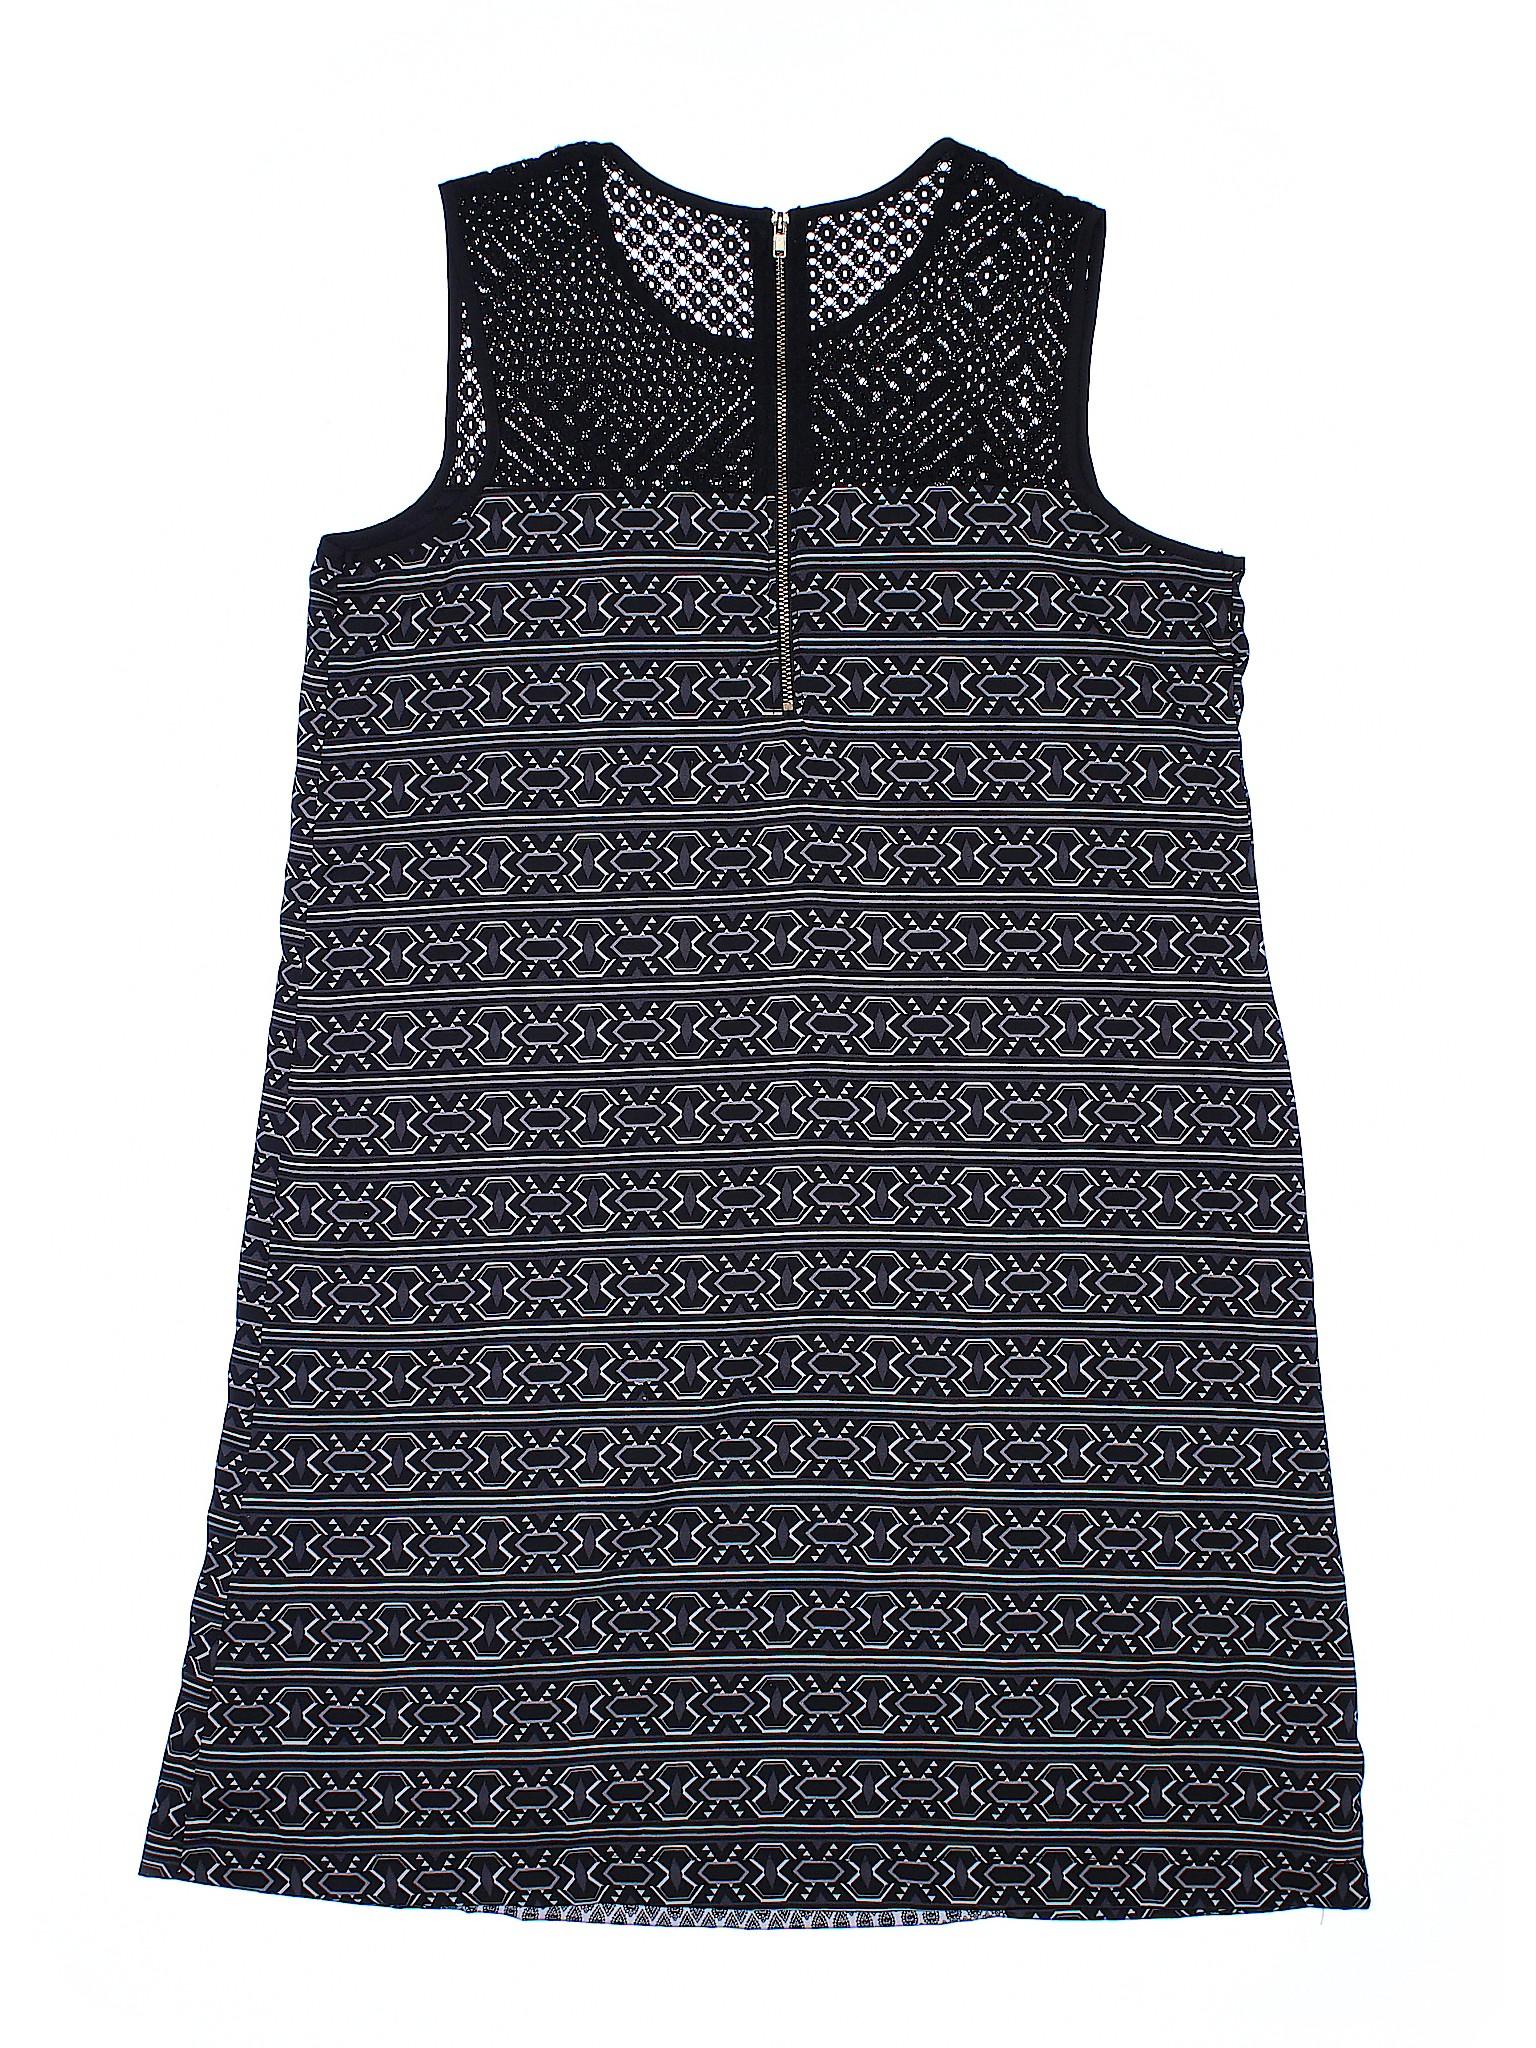 Dress Xhilaration Dress Selling Casual Selling Casual Xhilaration Selling w60R5xwqa